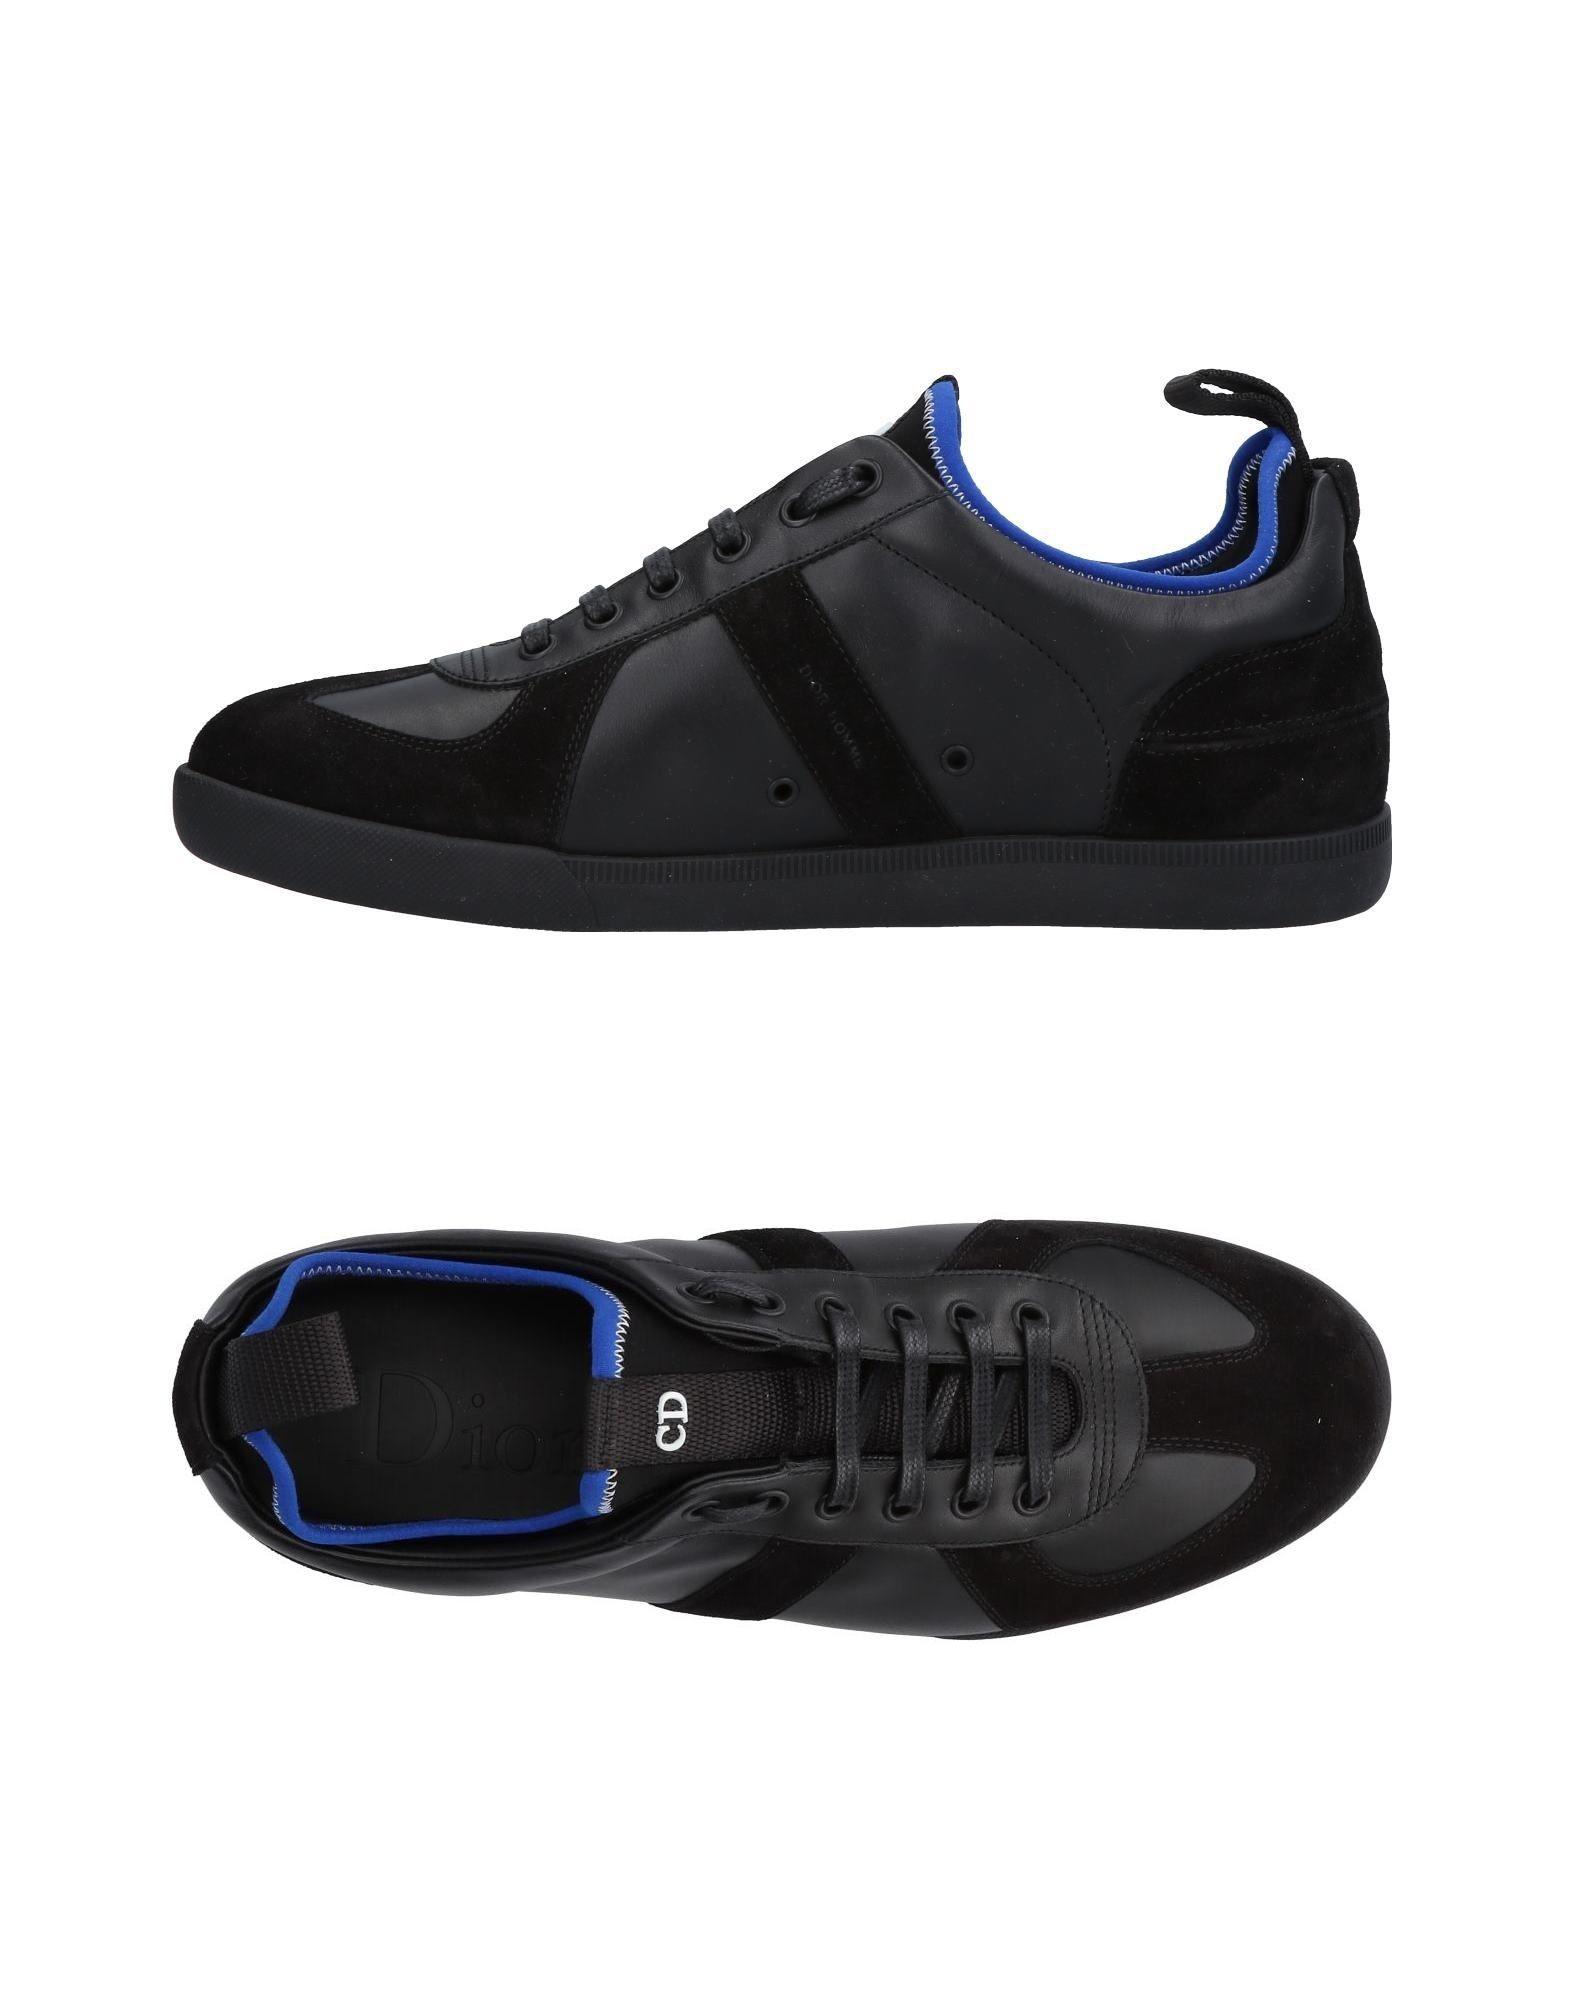 Dior Homme Sneakers Herren  11464630MH Gute Qualität beliebte Schuhe